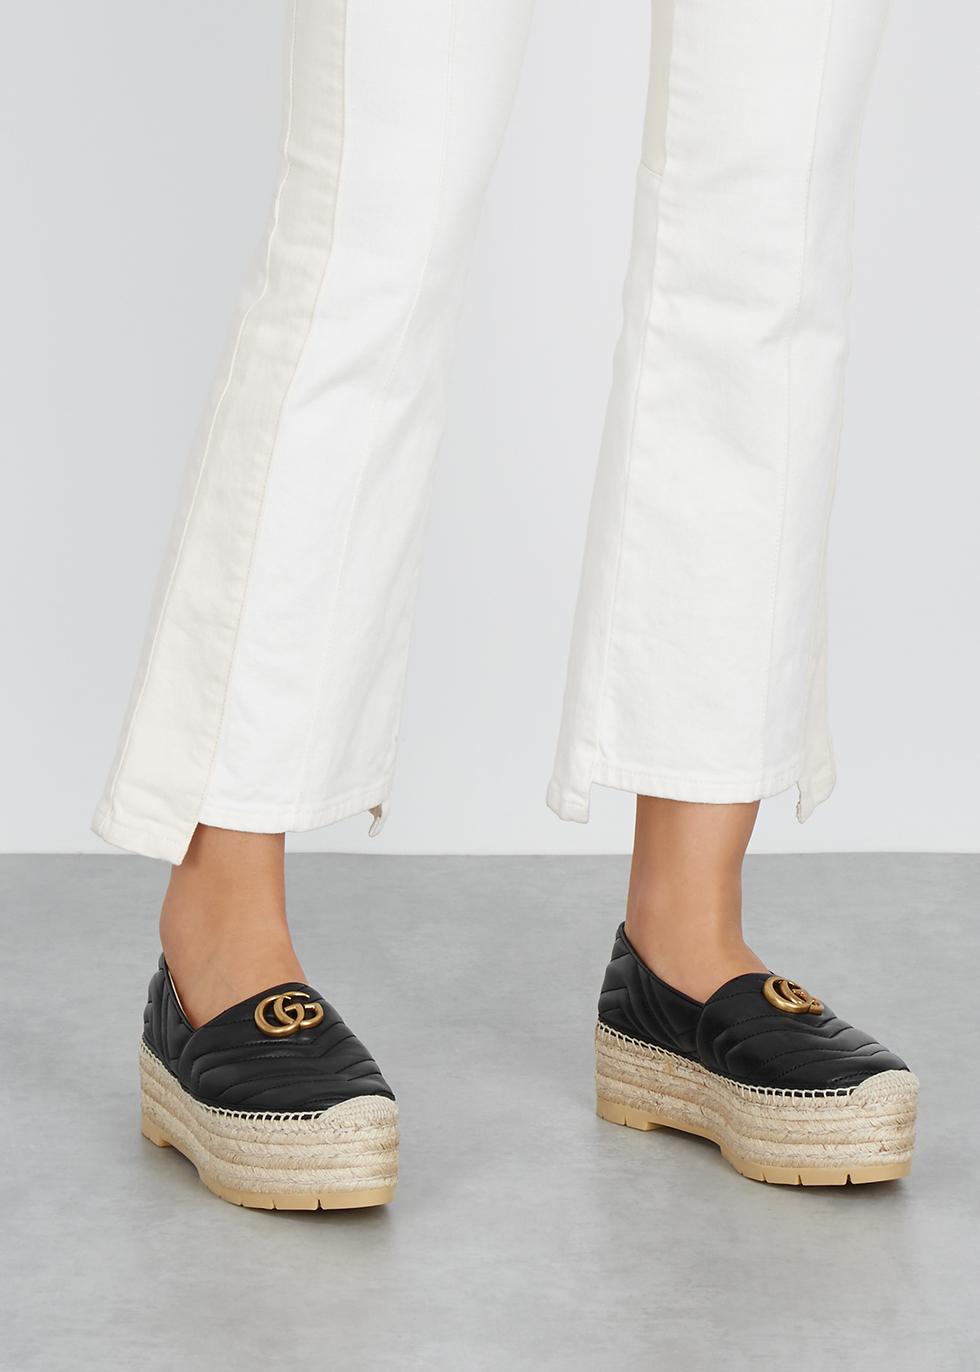 3cdd94783d4 Gucci Palmira 155 espadrille wedge sandals - Harvey Nichols